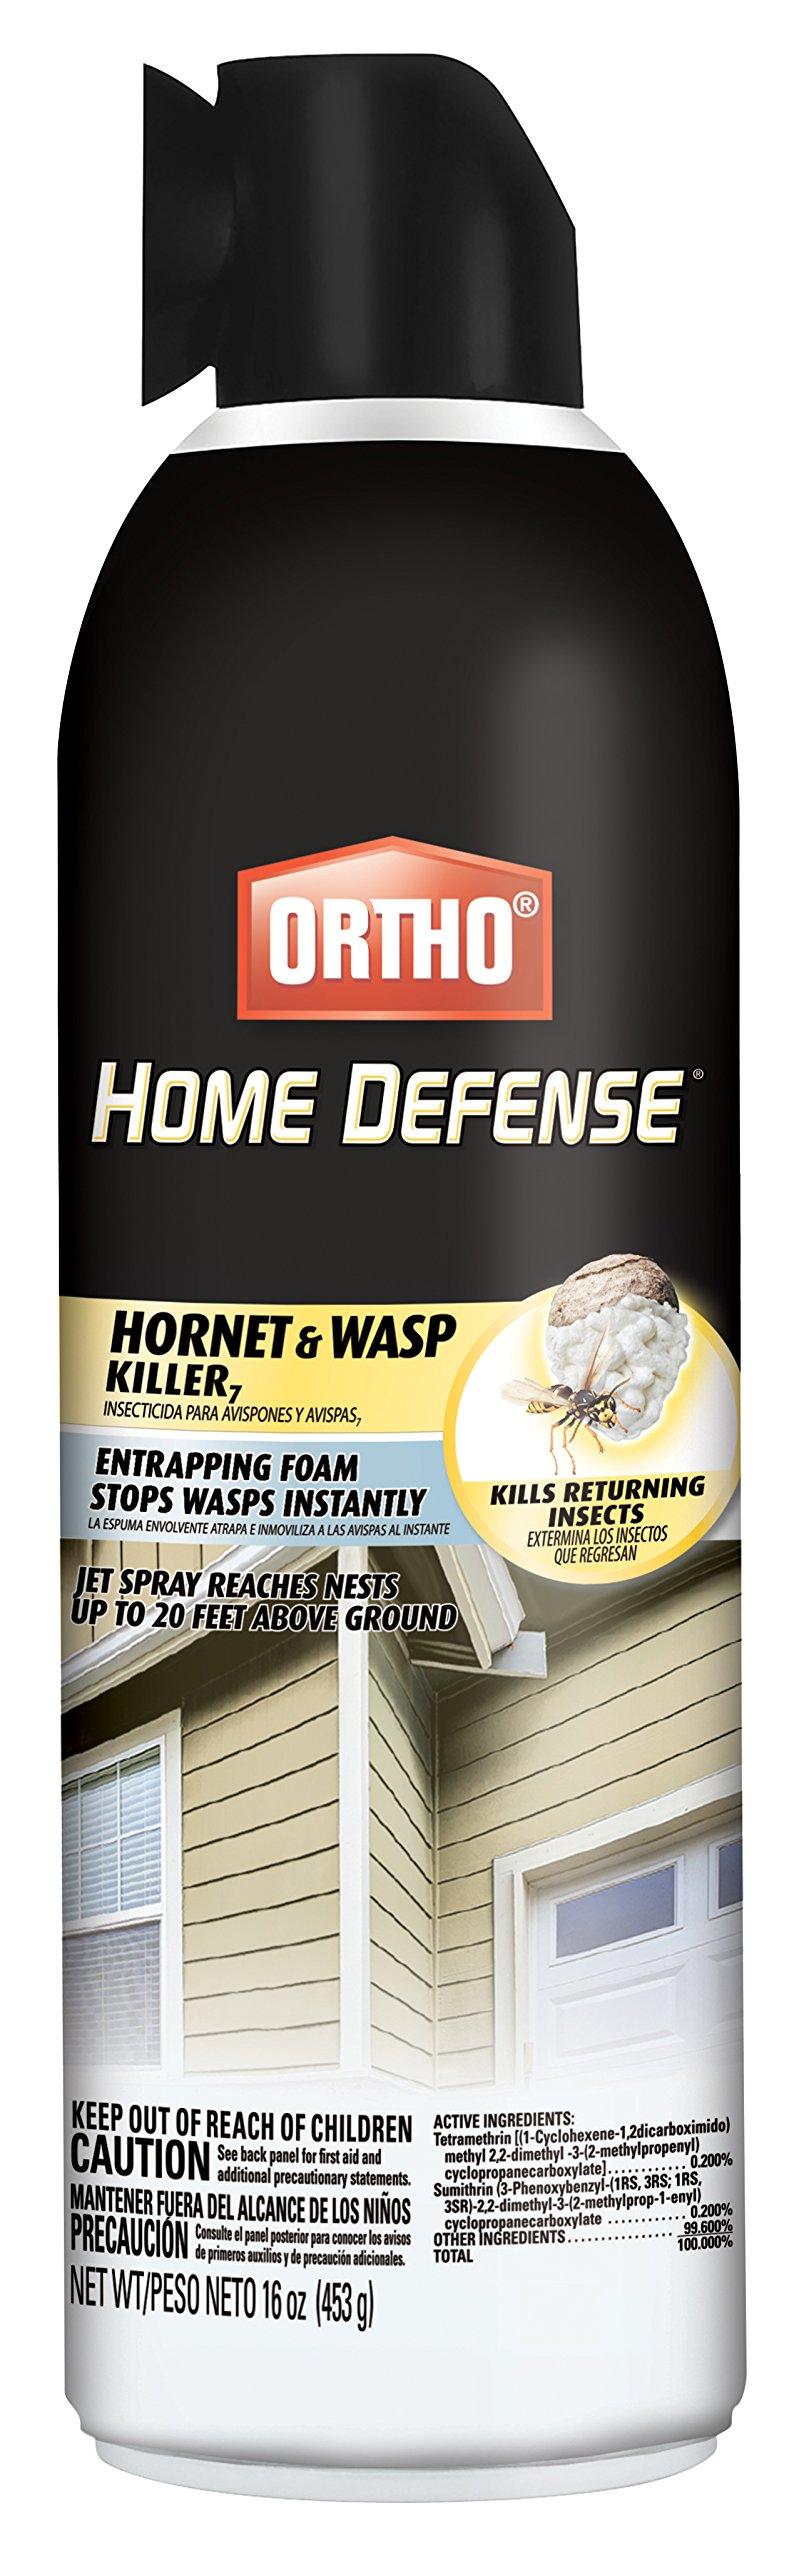 Ortho Home Defense Hornet & Wasp Killer Aerosol 16 oz by Ortho